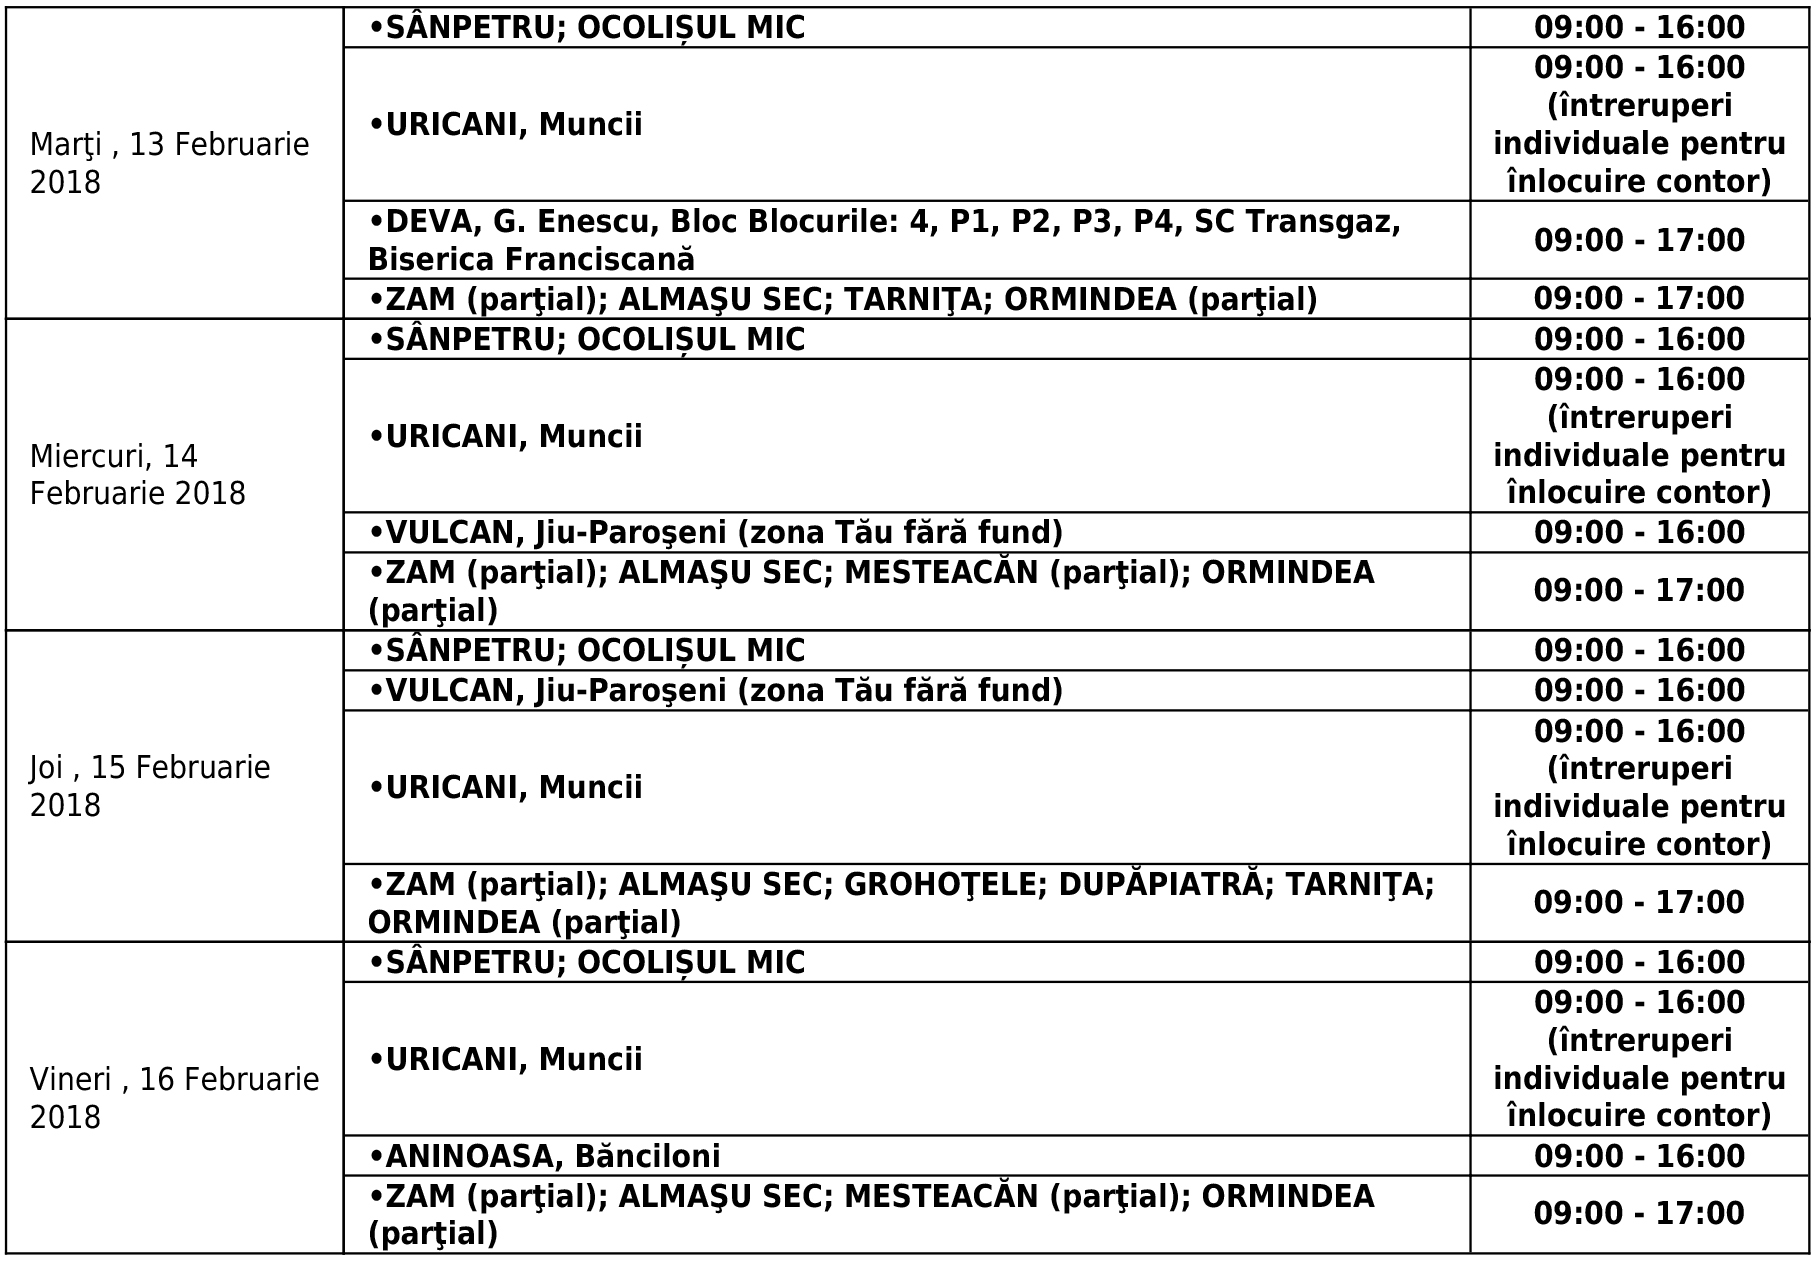 Intreruperi programate in zona Banat 12.02.2018 - 18